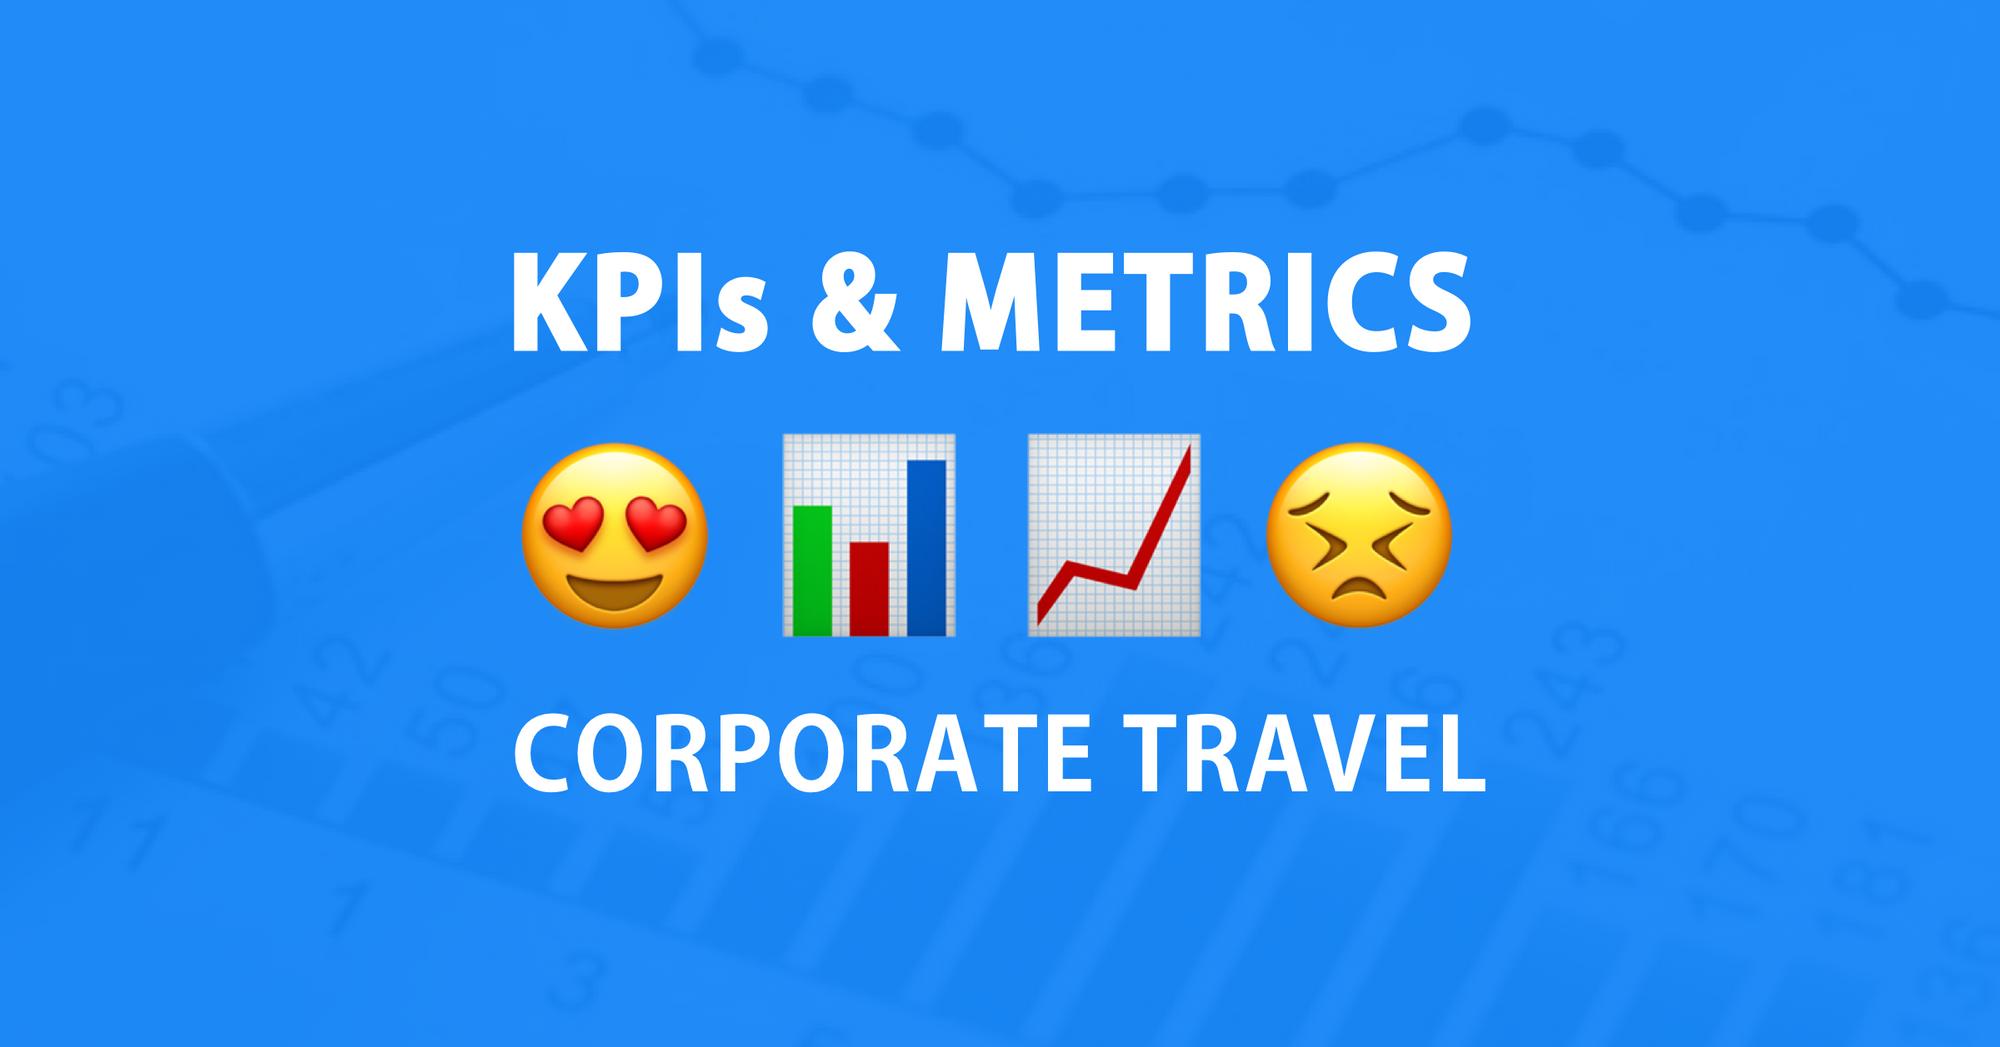 Measure your corporate travel program's effectiveness